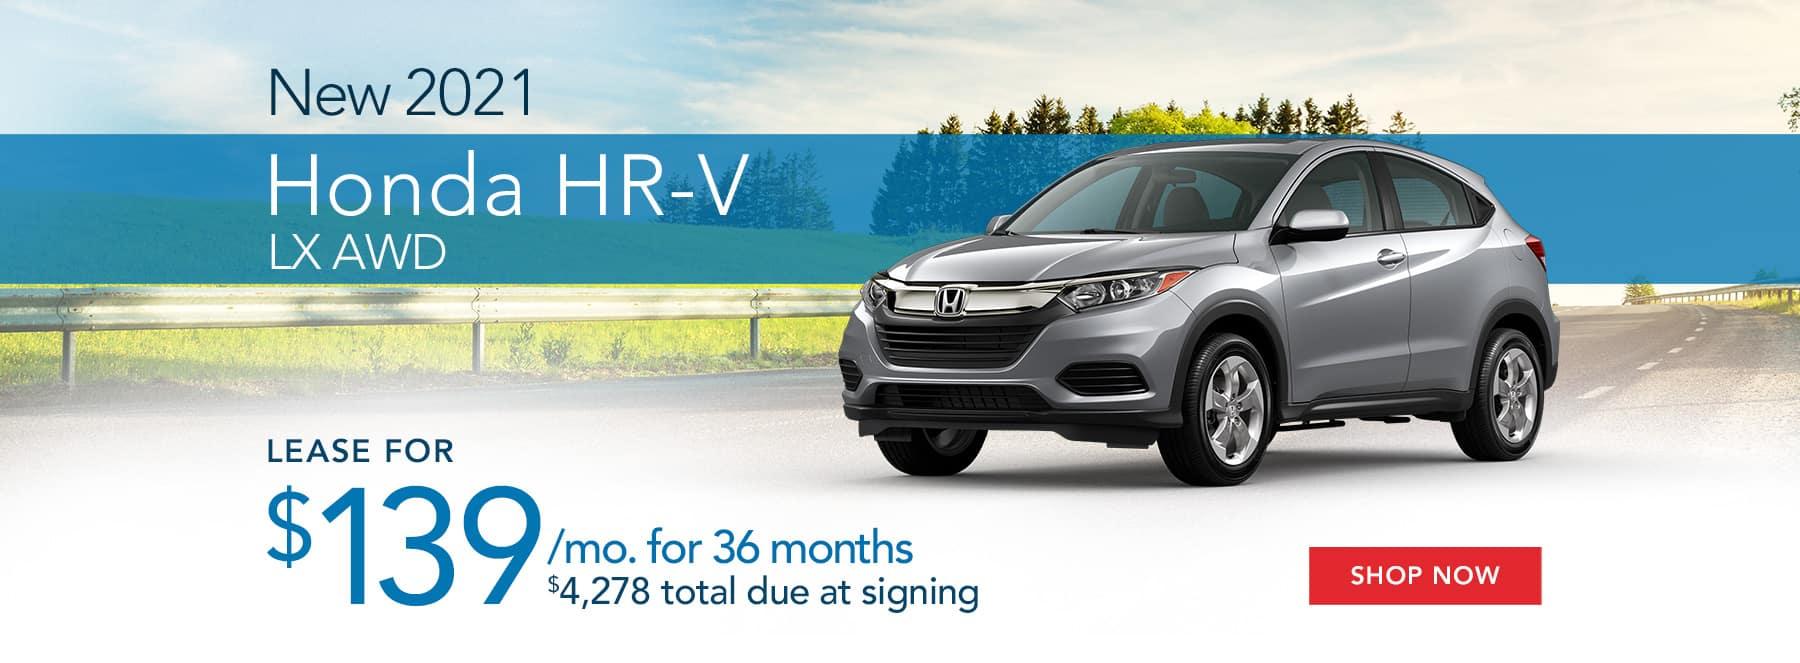 BHNA_1800x663_New 2021 Honda HR-V LX AWD _05'21